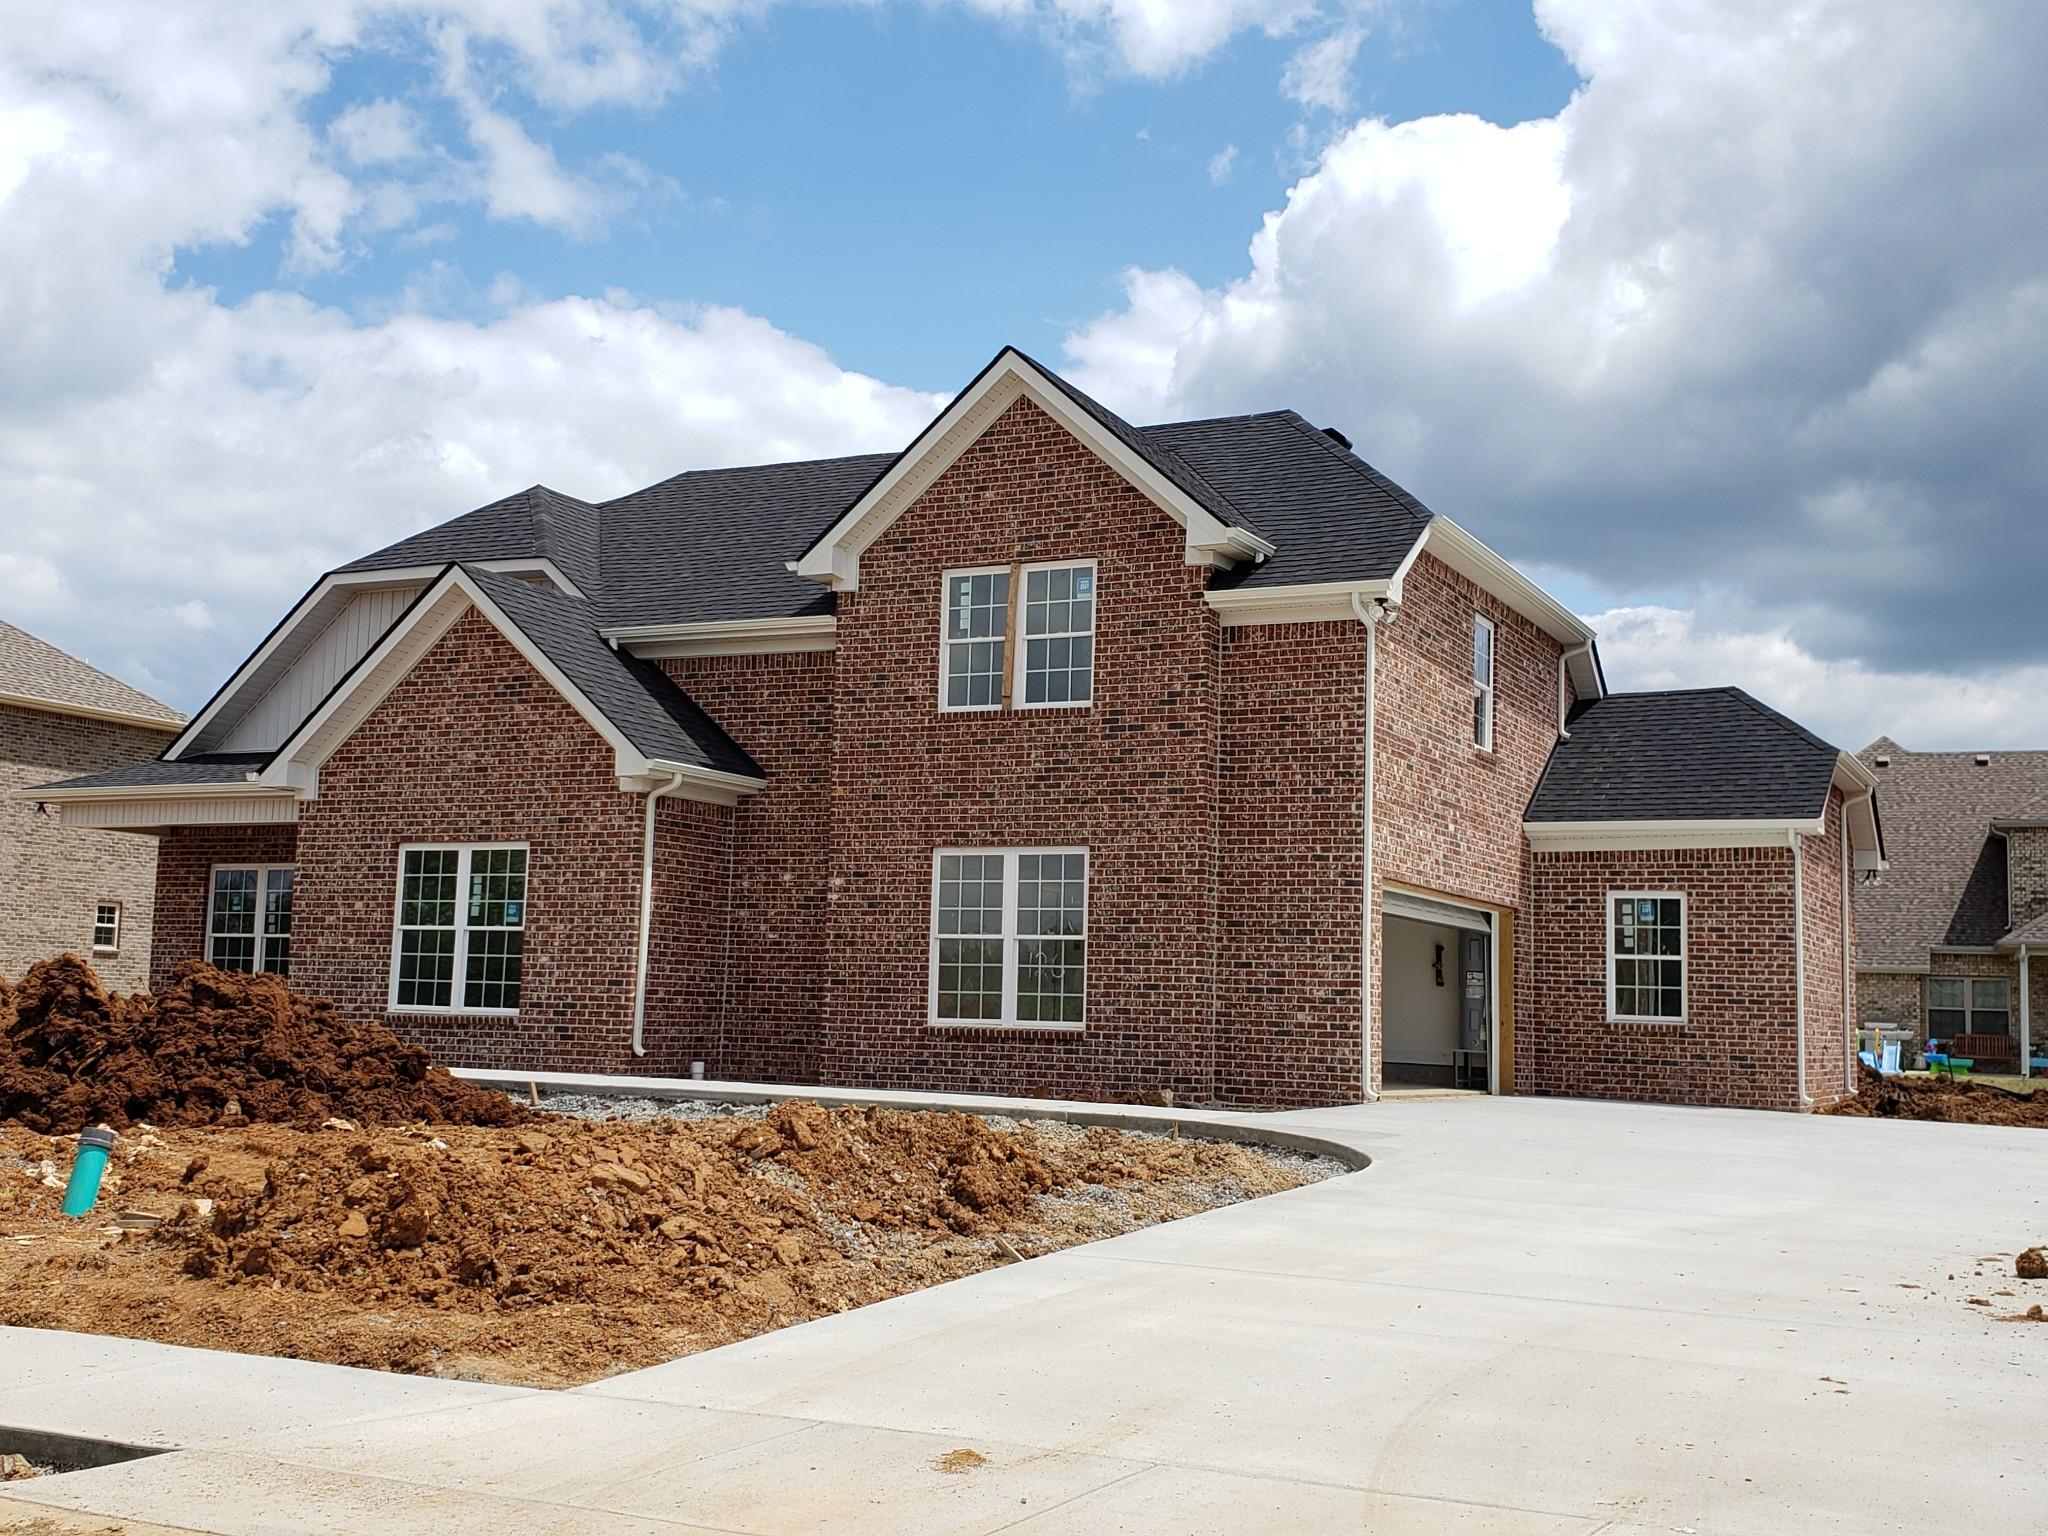 2319 Tredwell Ave. #126, Murfreesboro, TN 37128 - Murfreesboro, TN real estate listing